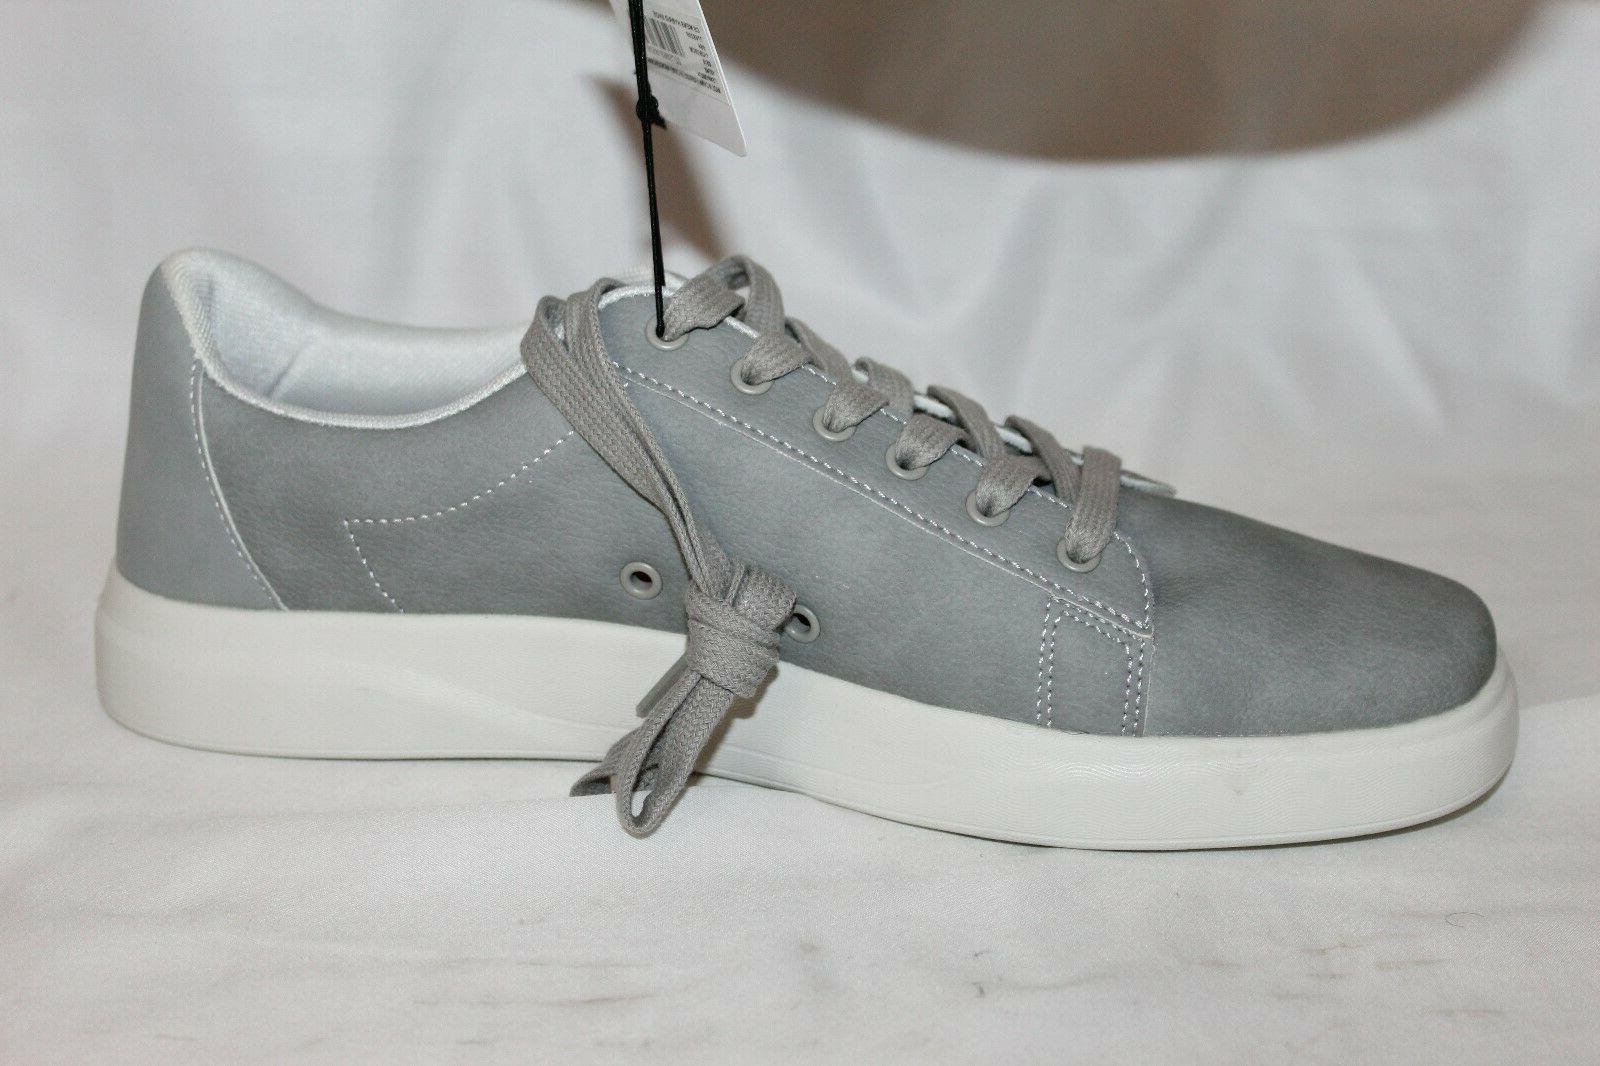 NEW Mens Quart Lightweight Sneaker Gray 11 NWOB